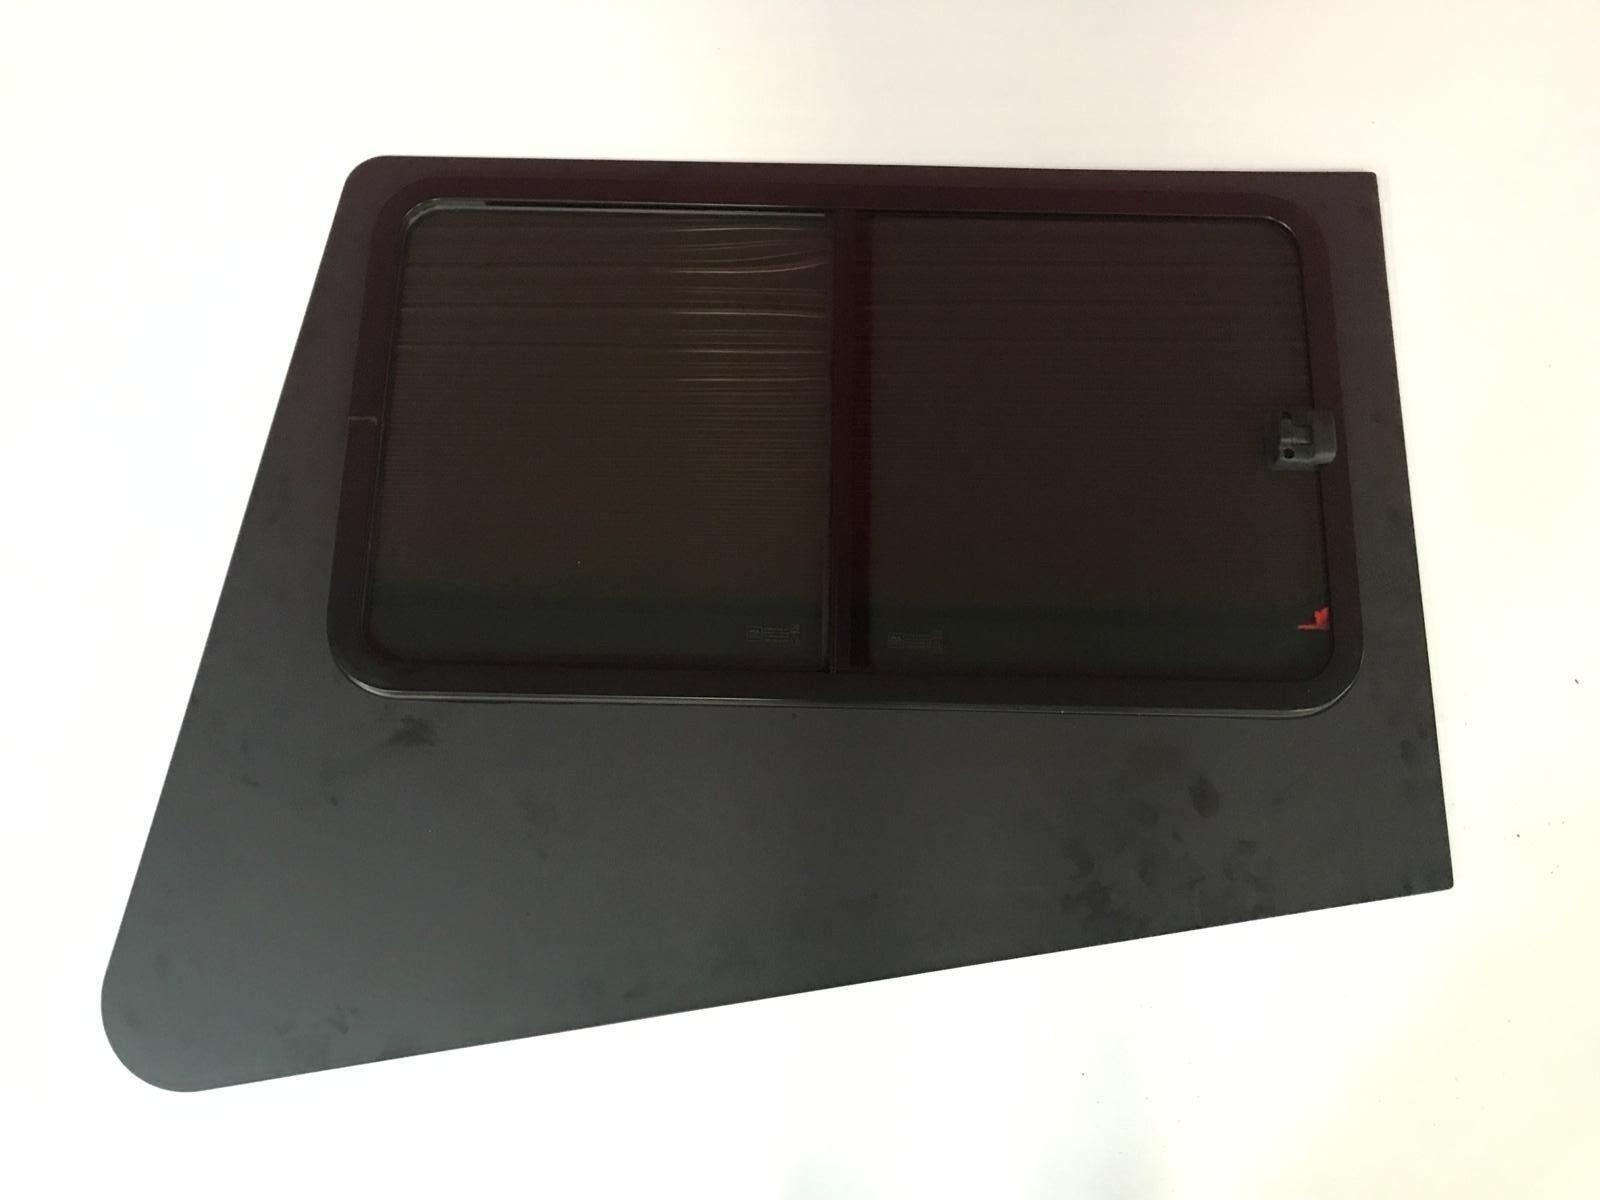 New Bonded Living Tear Drop Shaped Sliding Window horsebox measures 1137 x 690